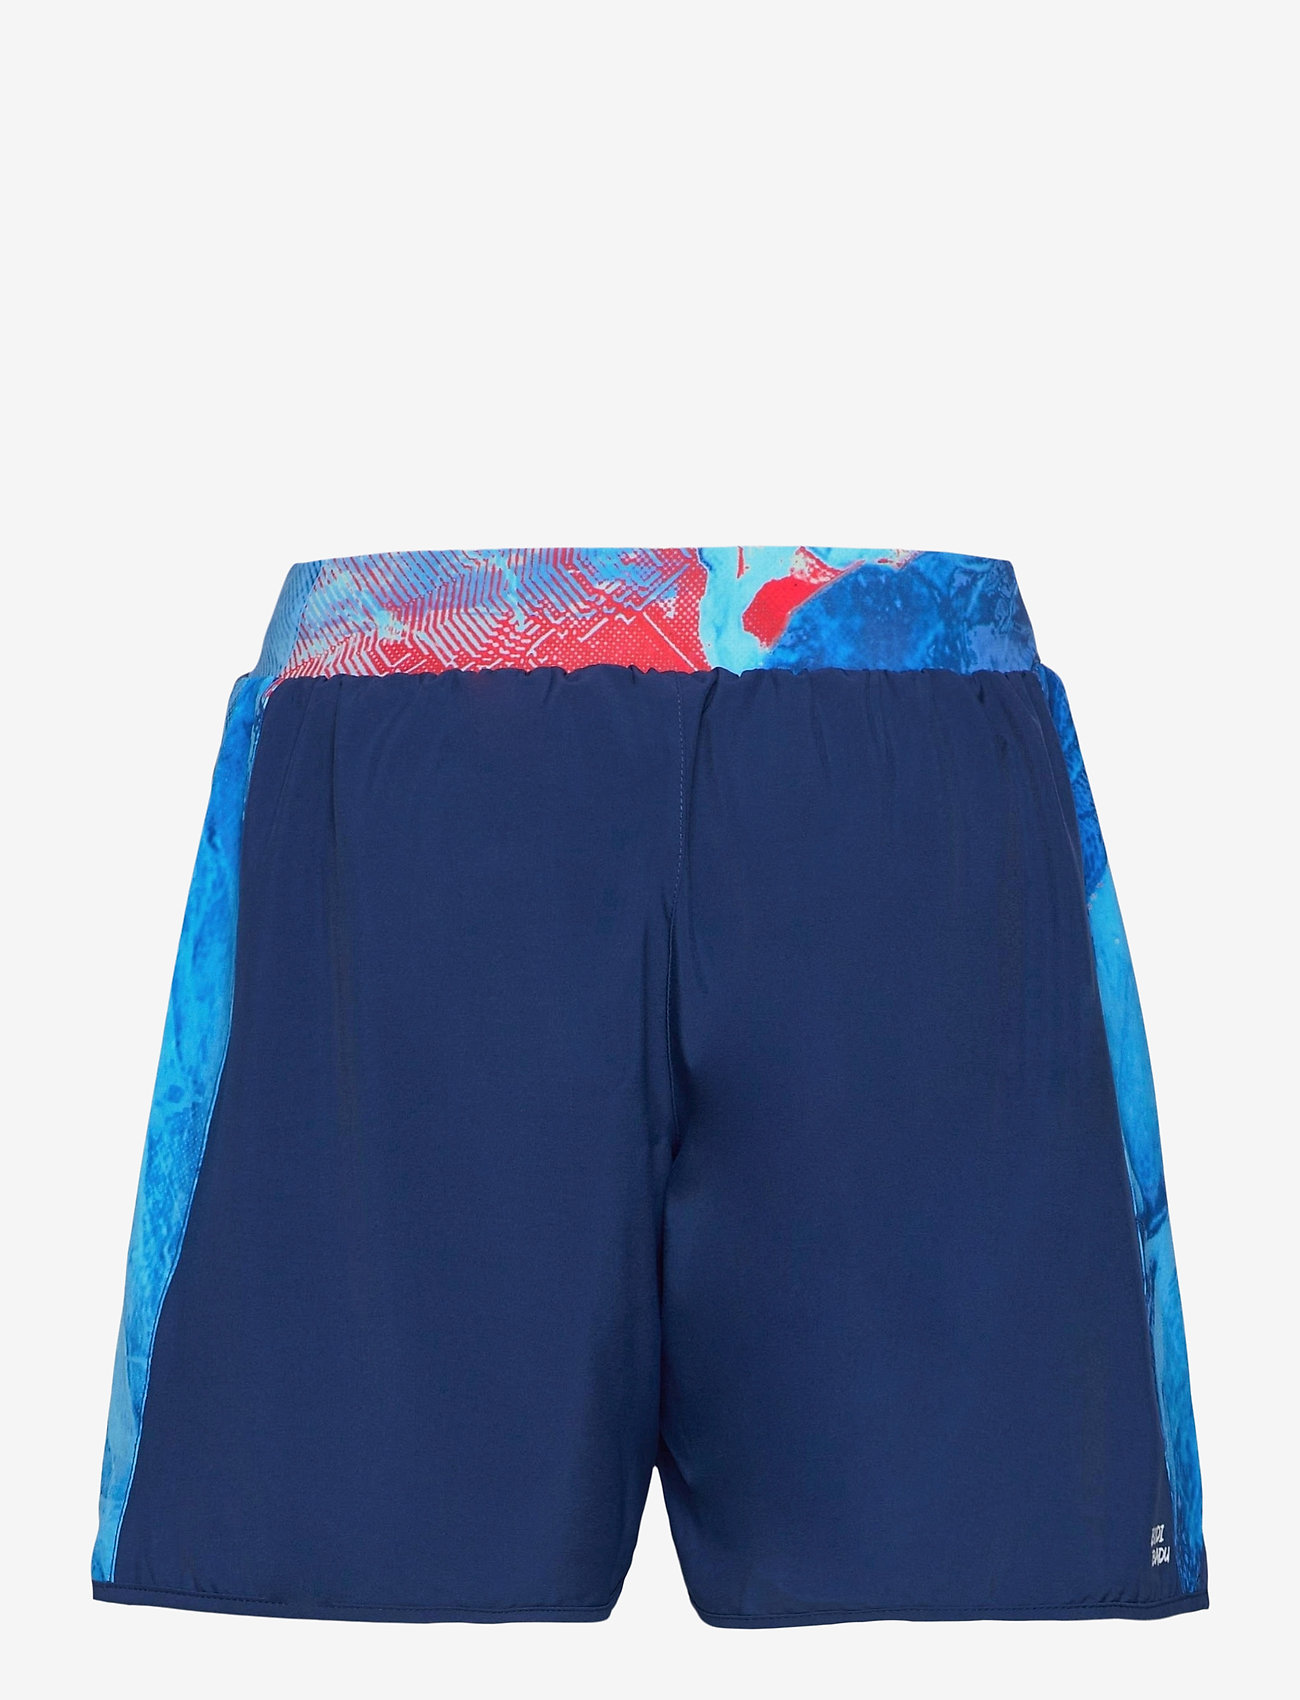 BIDI BADU - Adnan 7in Jeans Tech Shorts - training korte broek - dark blue, aqua - 1